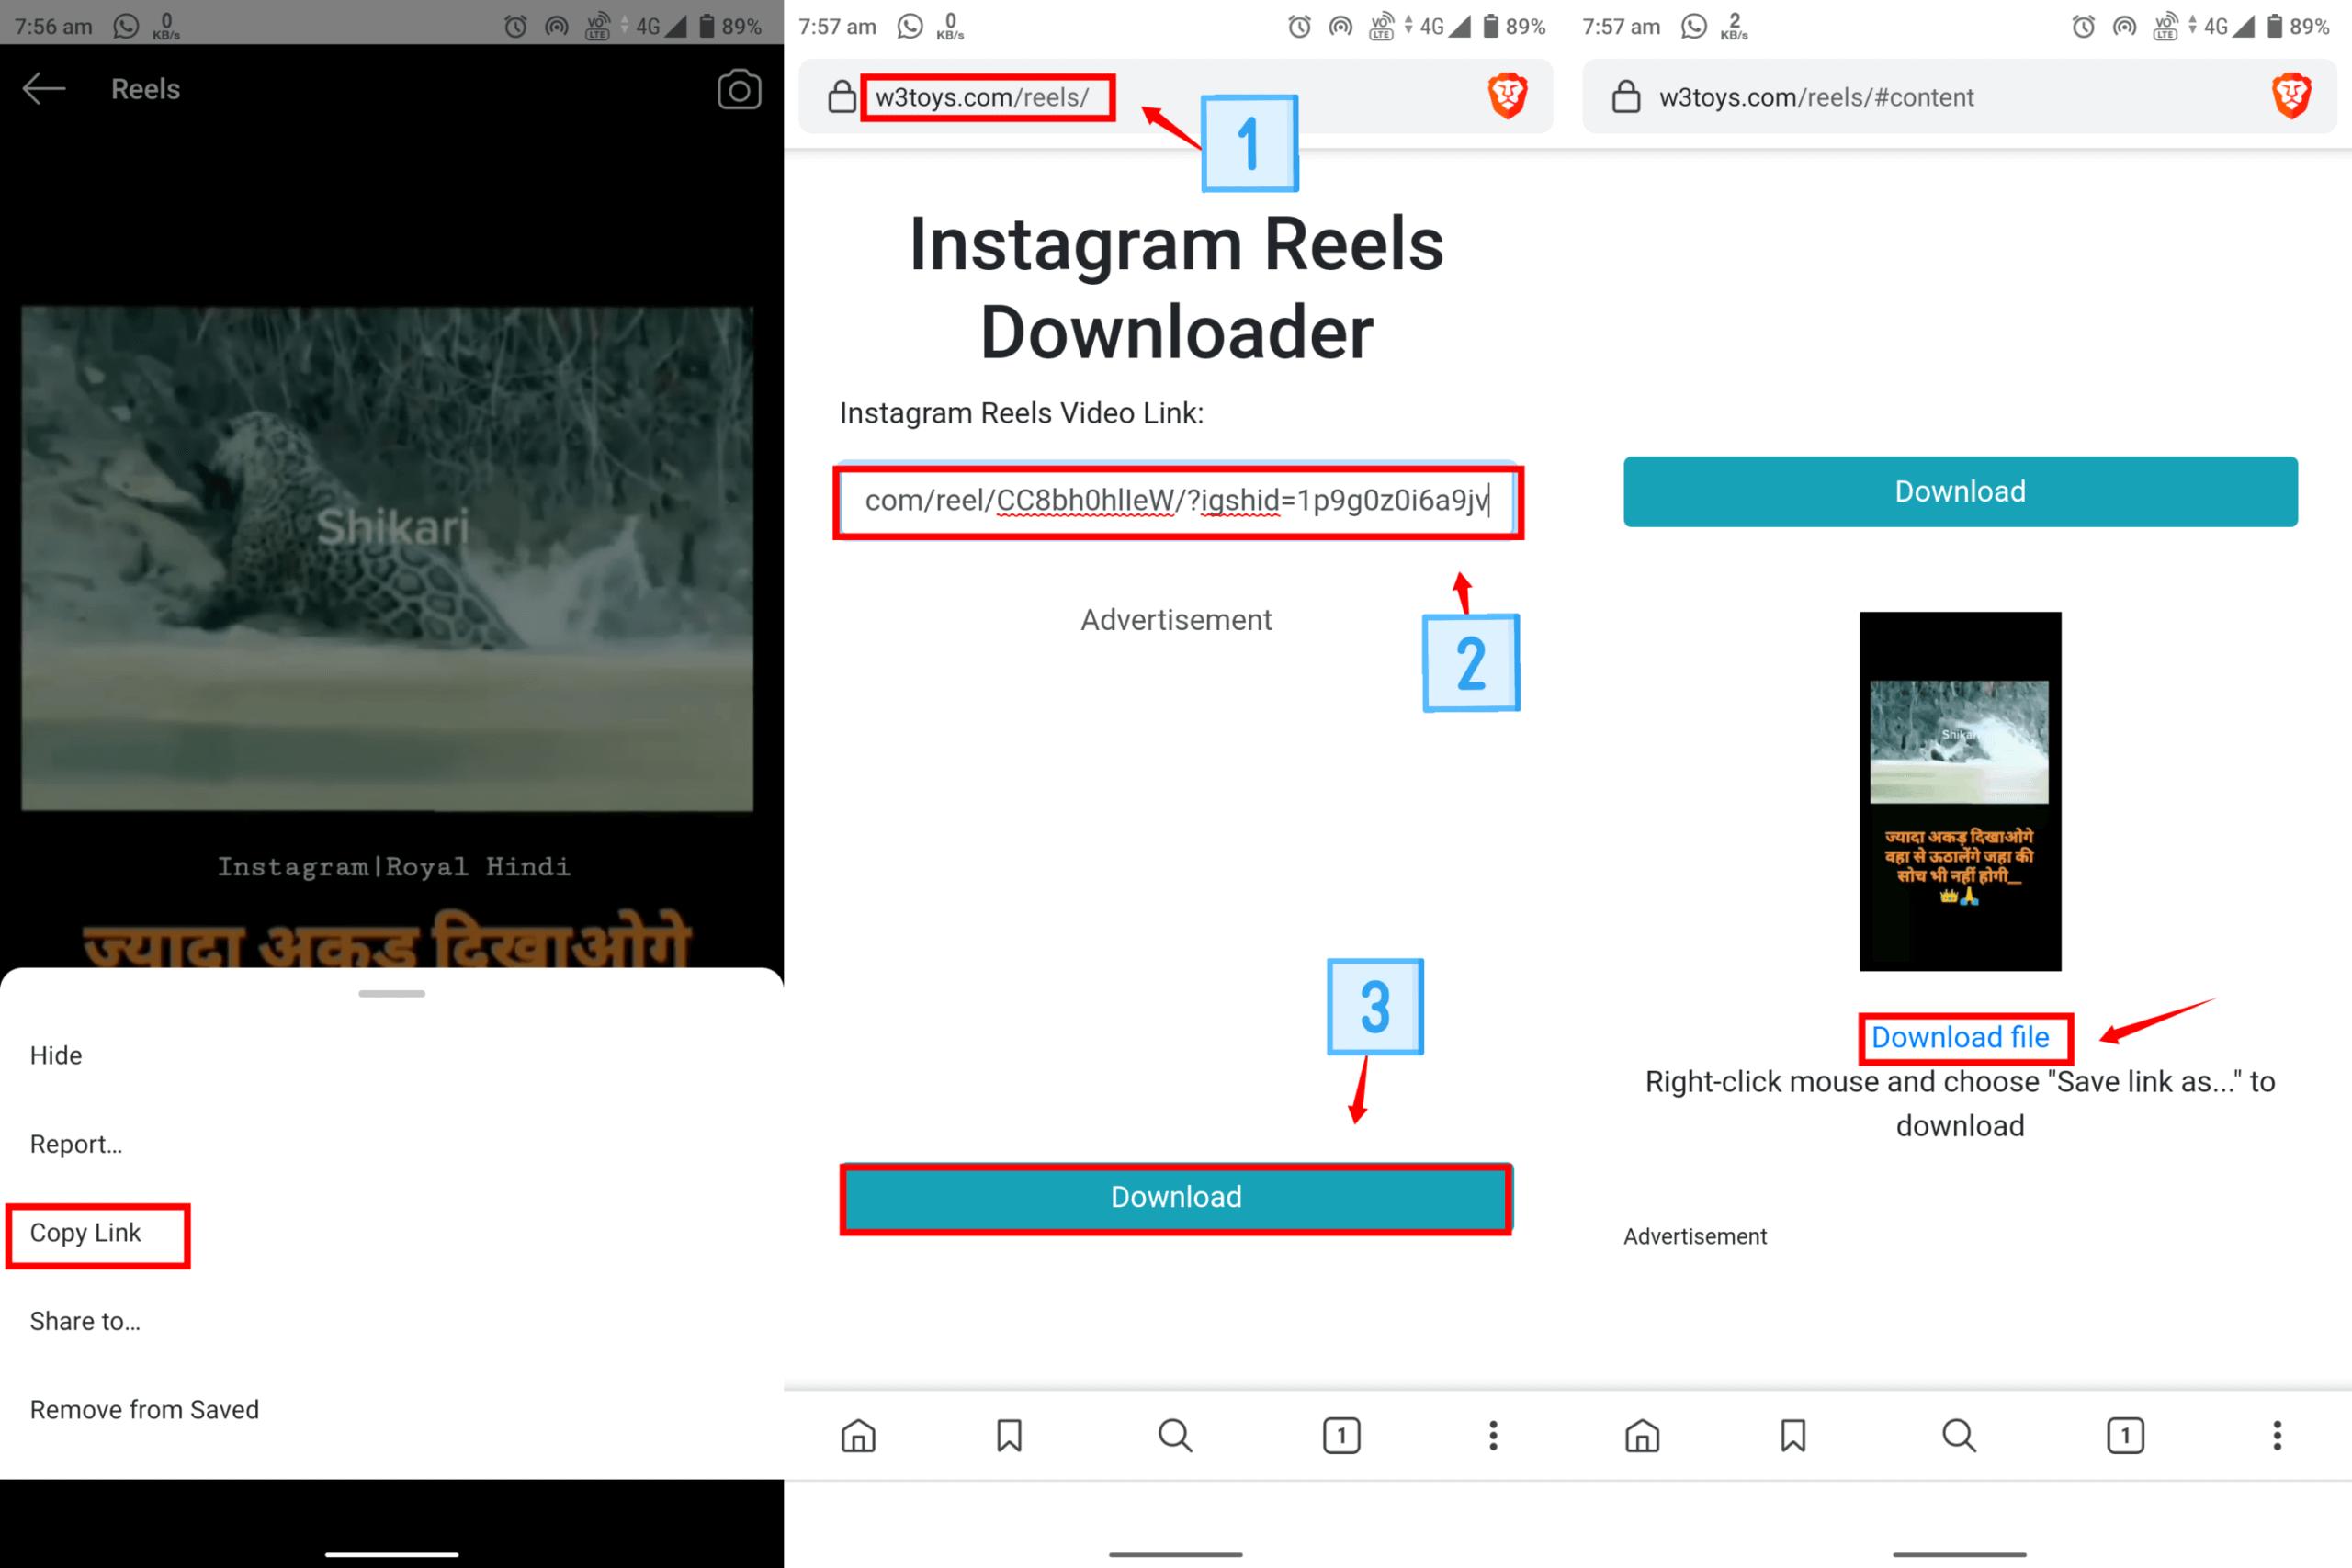 Instagram reels video downloader